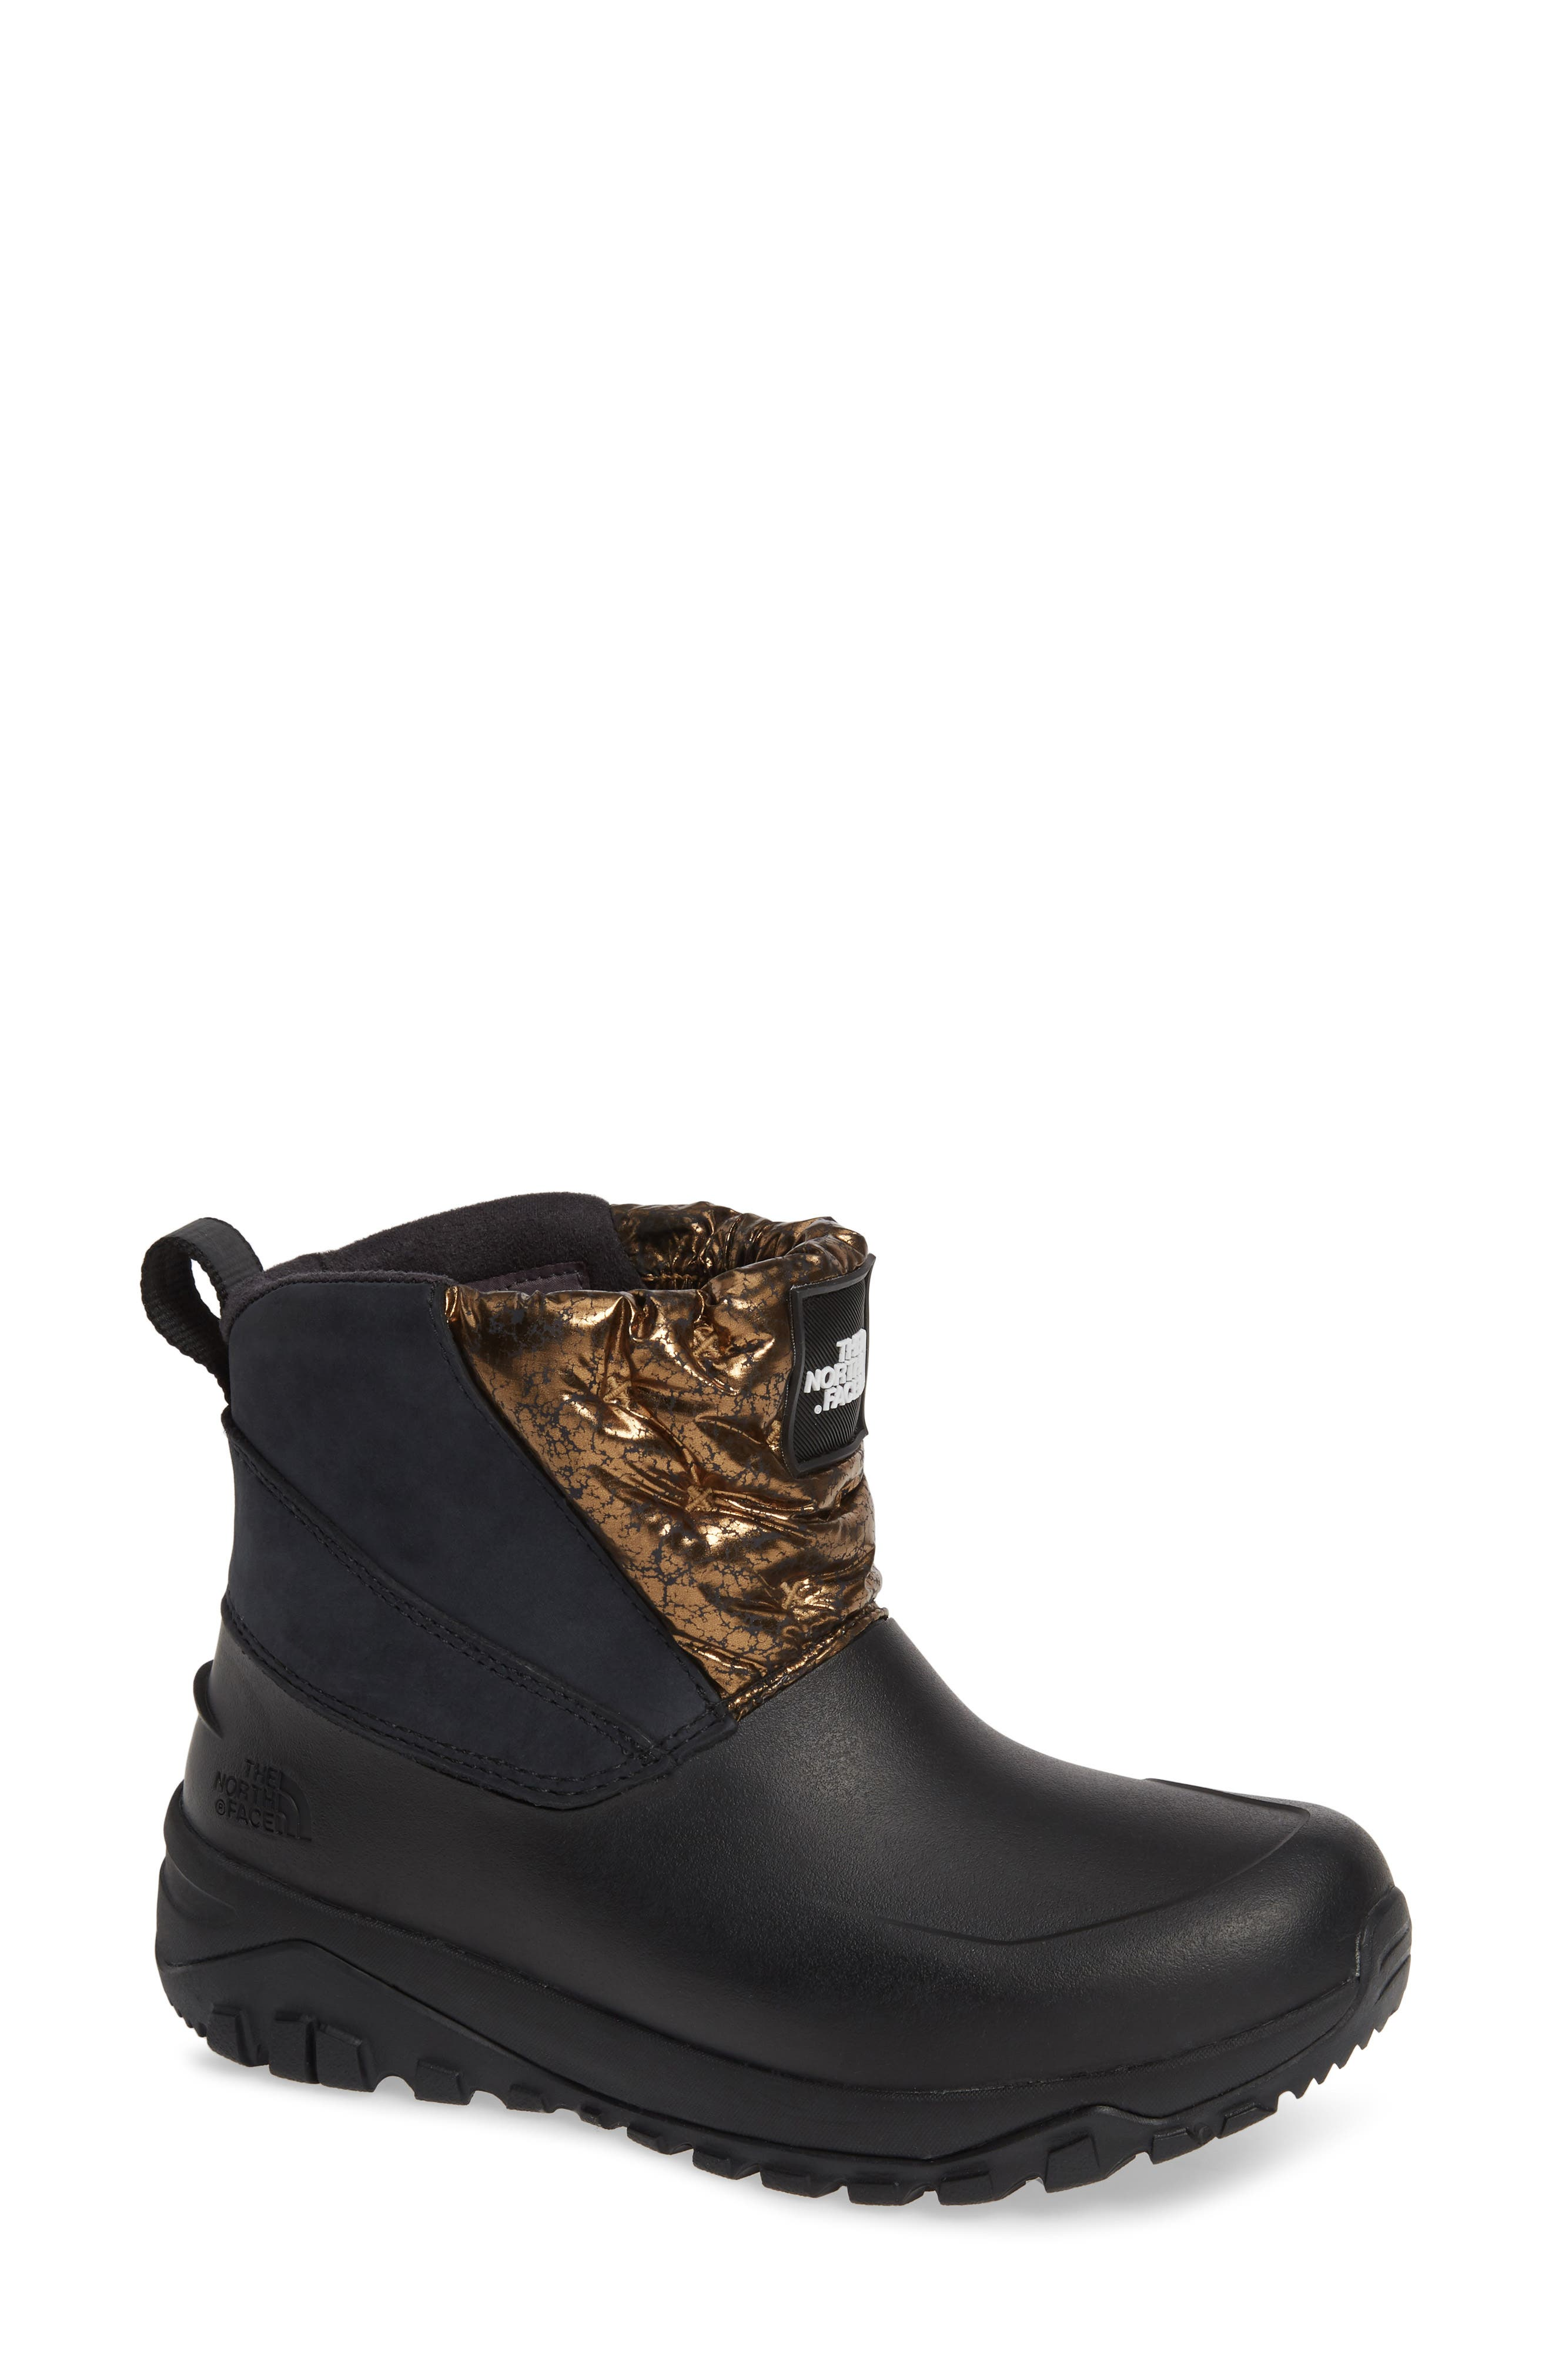 Yukiona Waterproof Ankle Boot,                             Main thumbnail 1, color,                             BLACK/ METALLIC COPPER